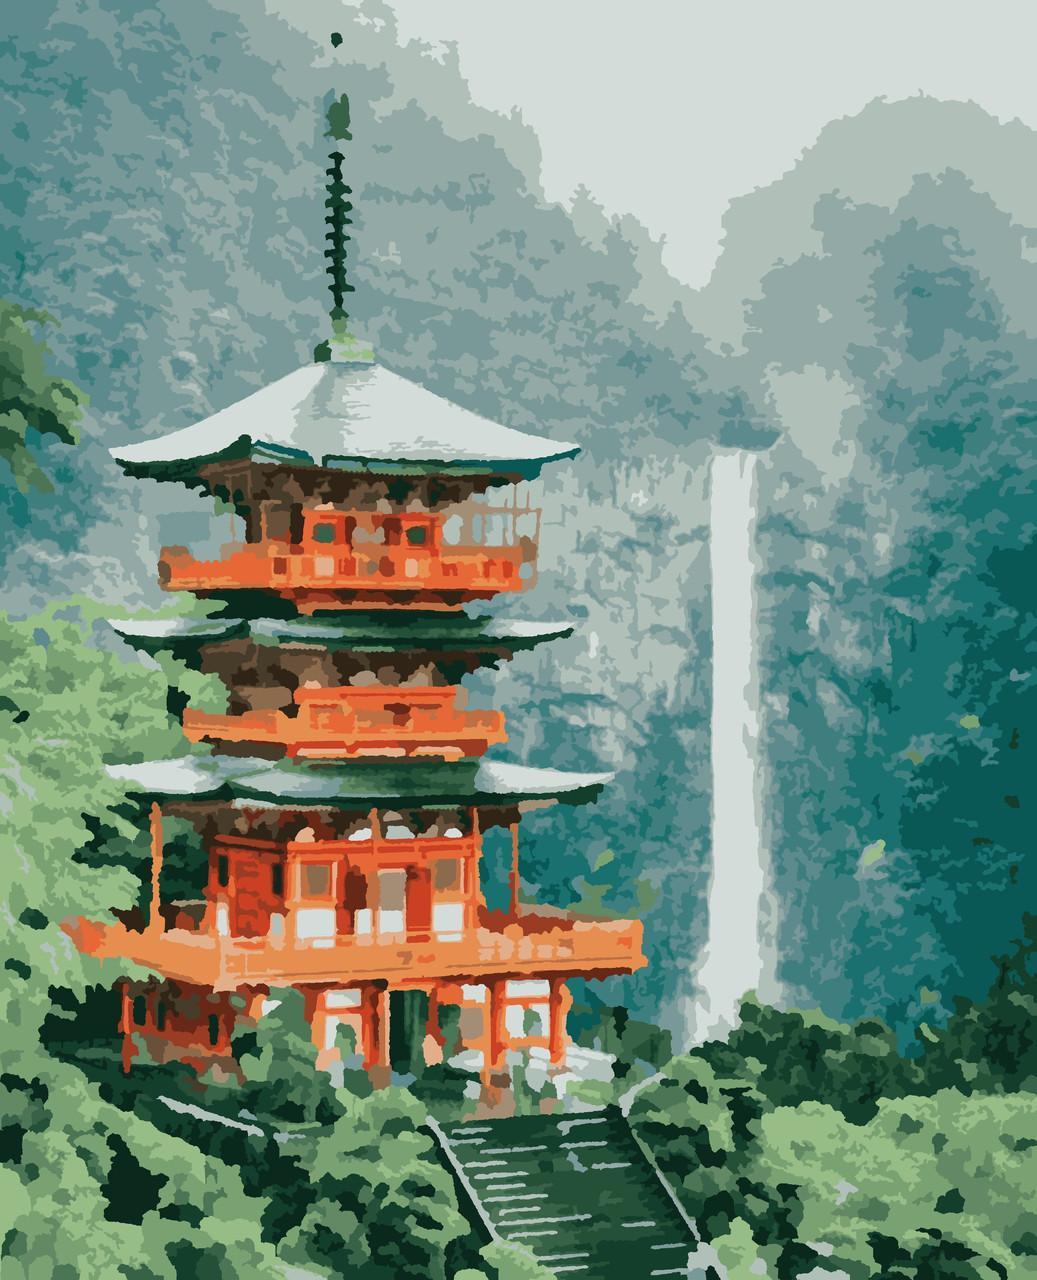 Картина рисование по номерам Пагода PN6210 Artissimo 40х50см розпис за номерами набір, фарби, пензлі, полотно